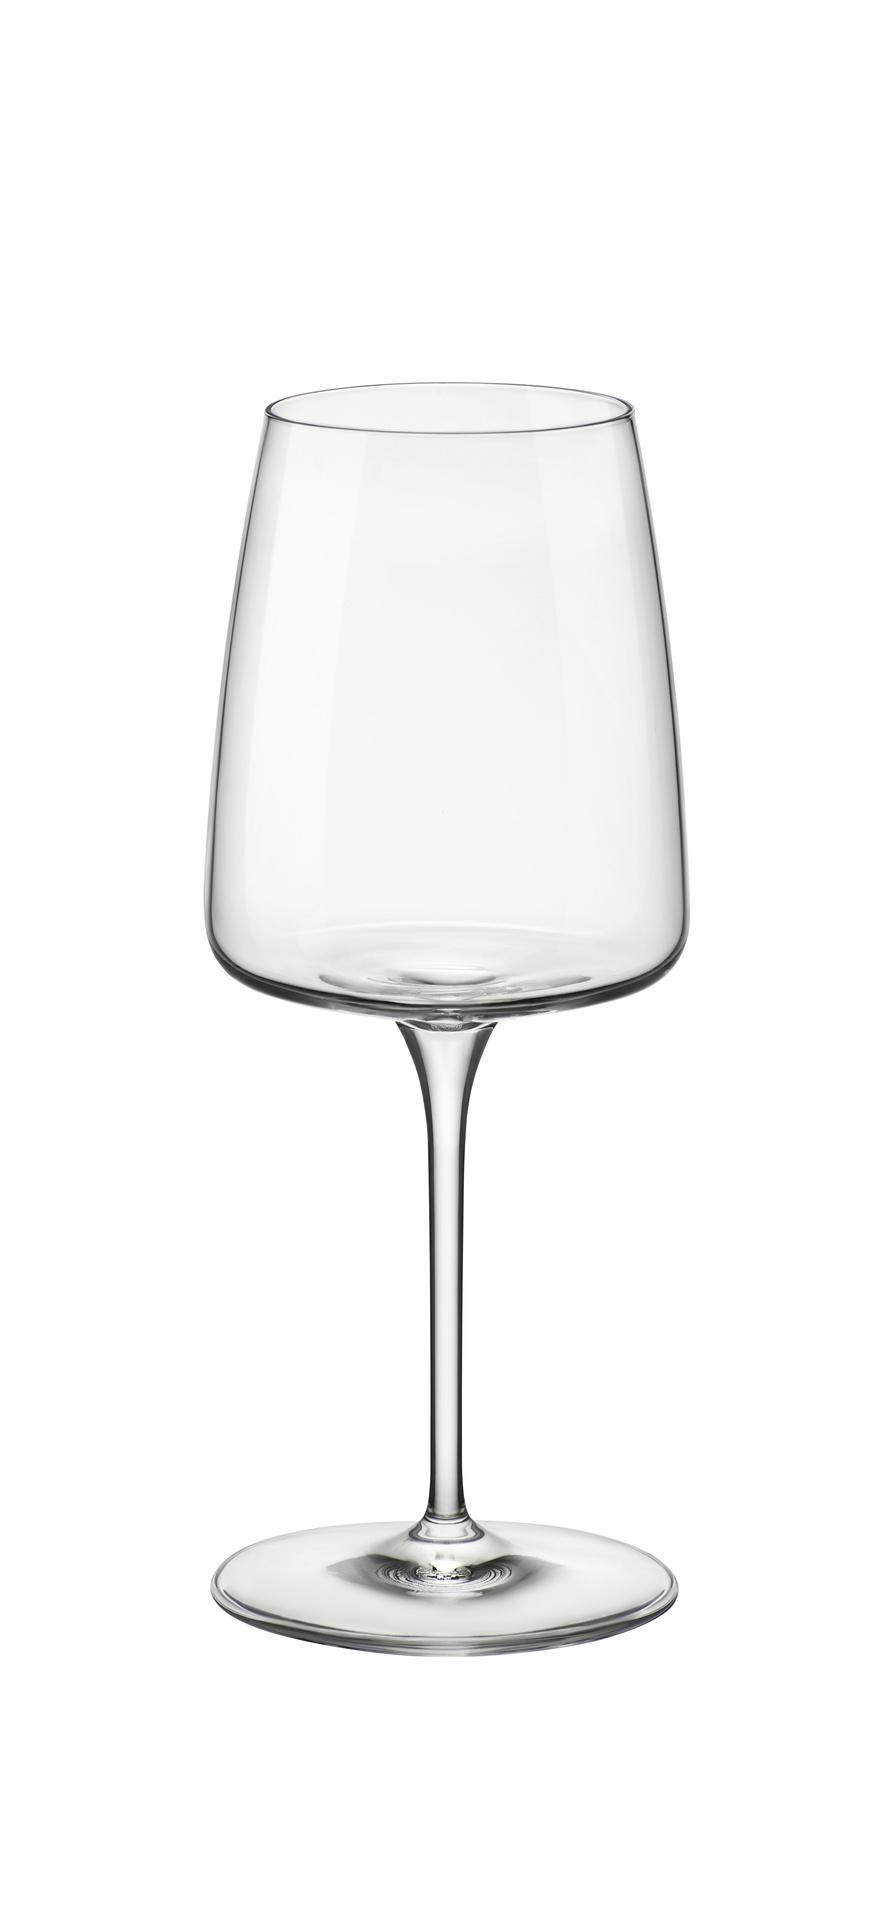 Sklenice na víno 37,8 cl - Bianco